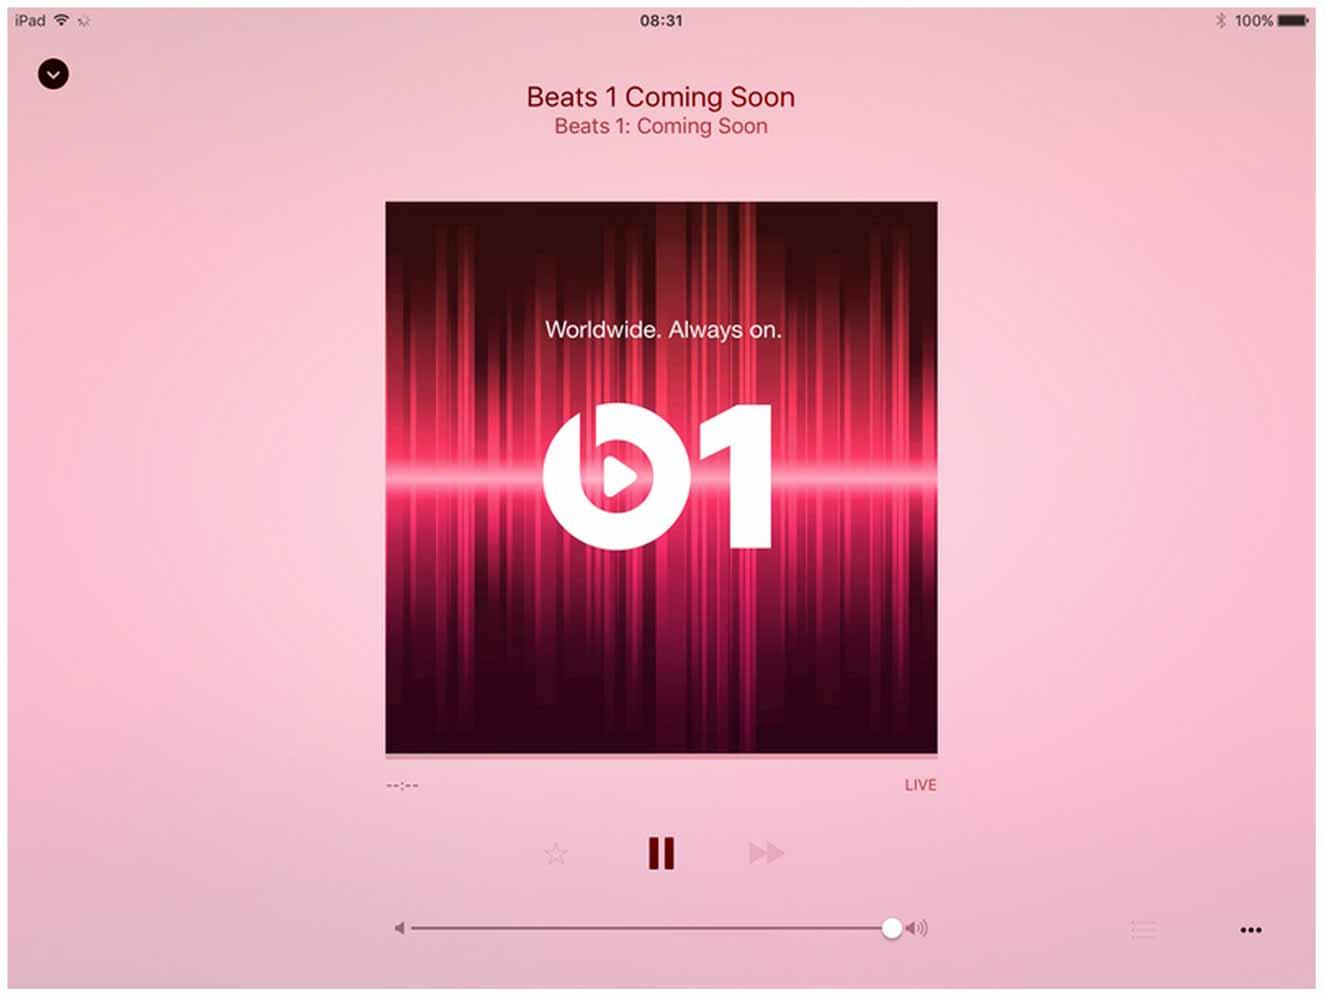 iOS 8.4 betaとiOS 9 betaでは「Apple Music」の一部であるラジオステーション「Beats 1」が表示される